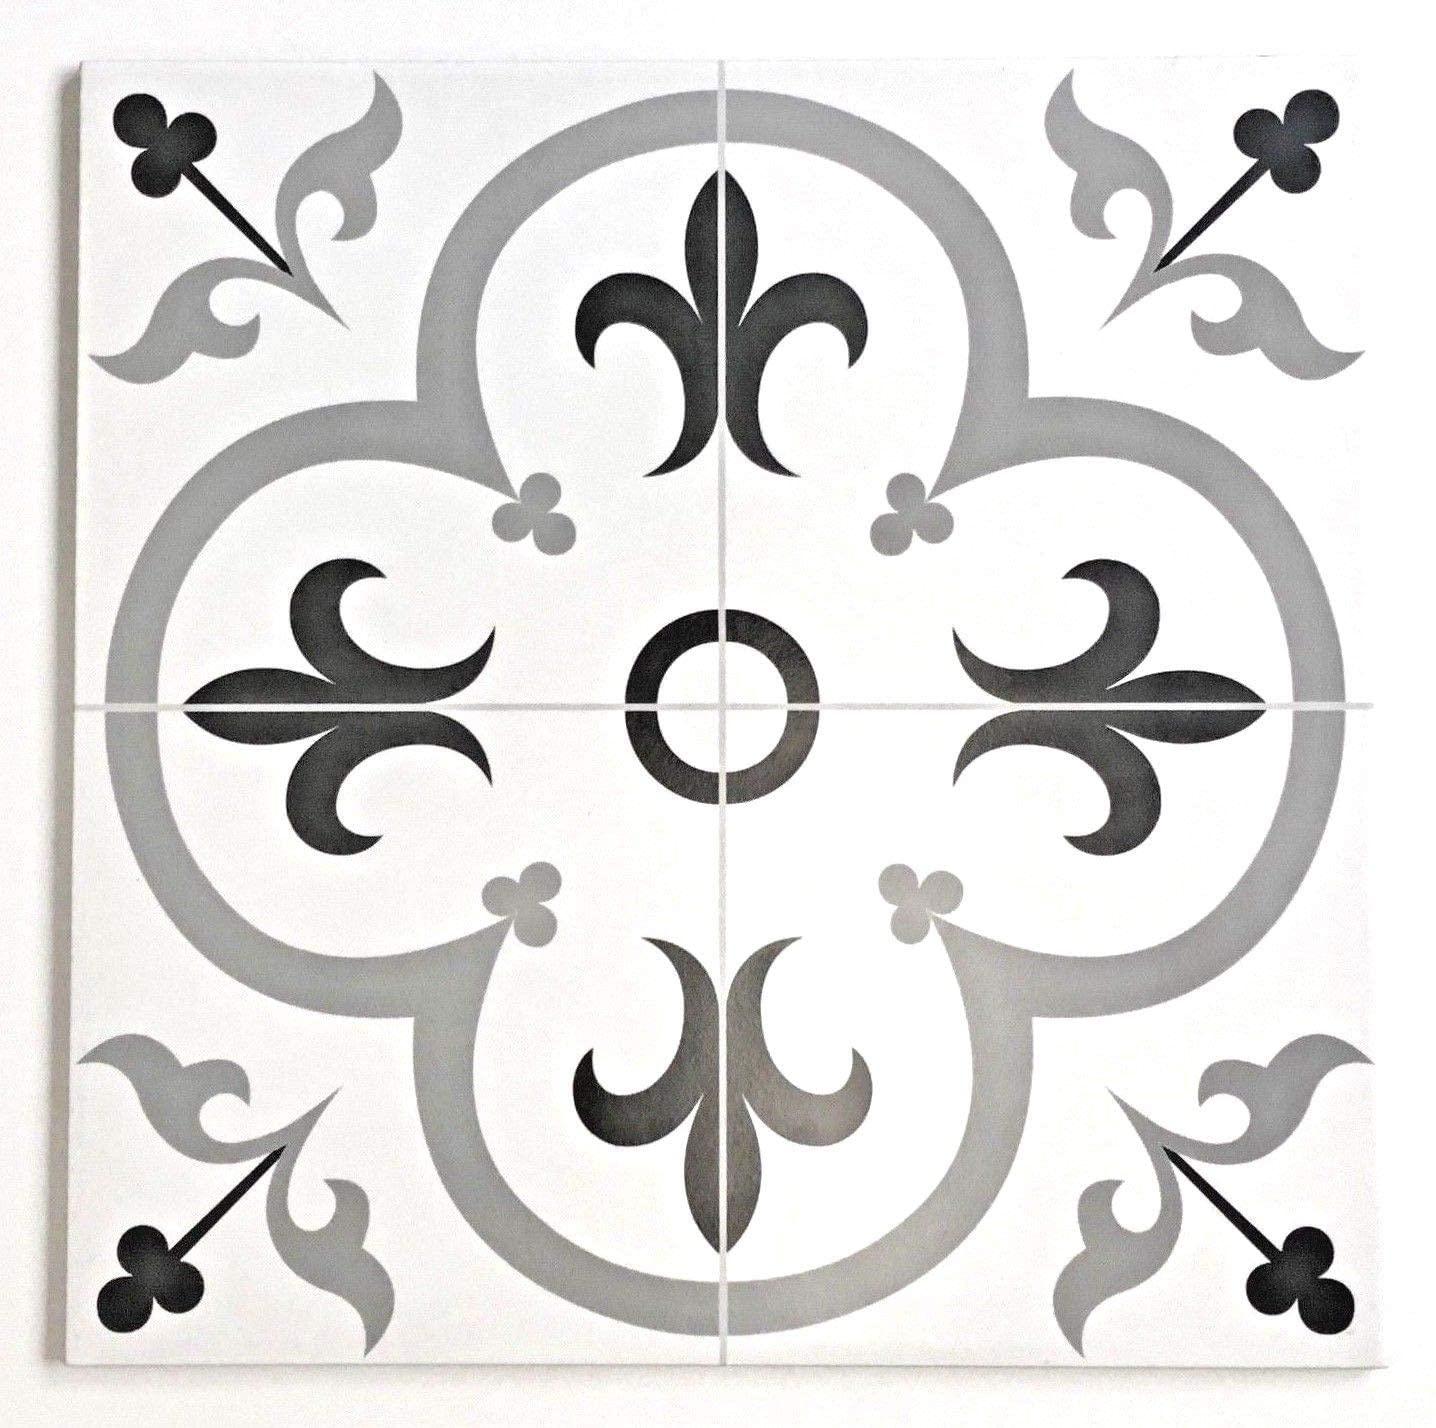 Valencia 16 inch x 16 inch Ceramic Floor Tile